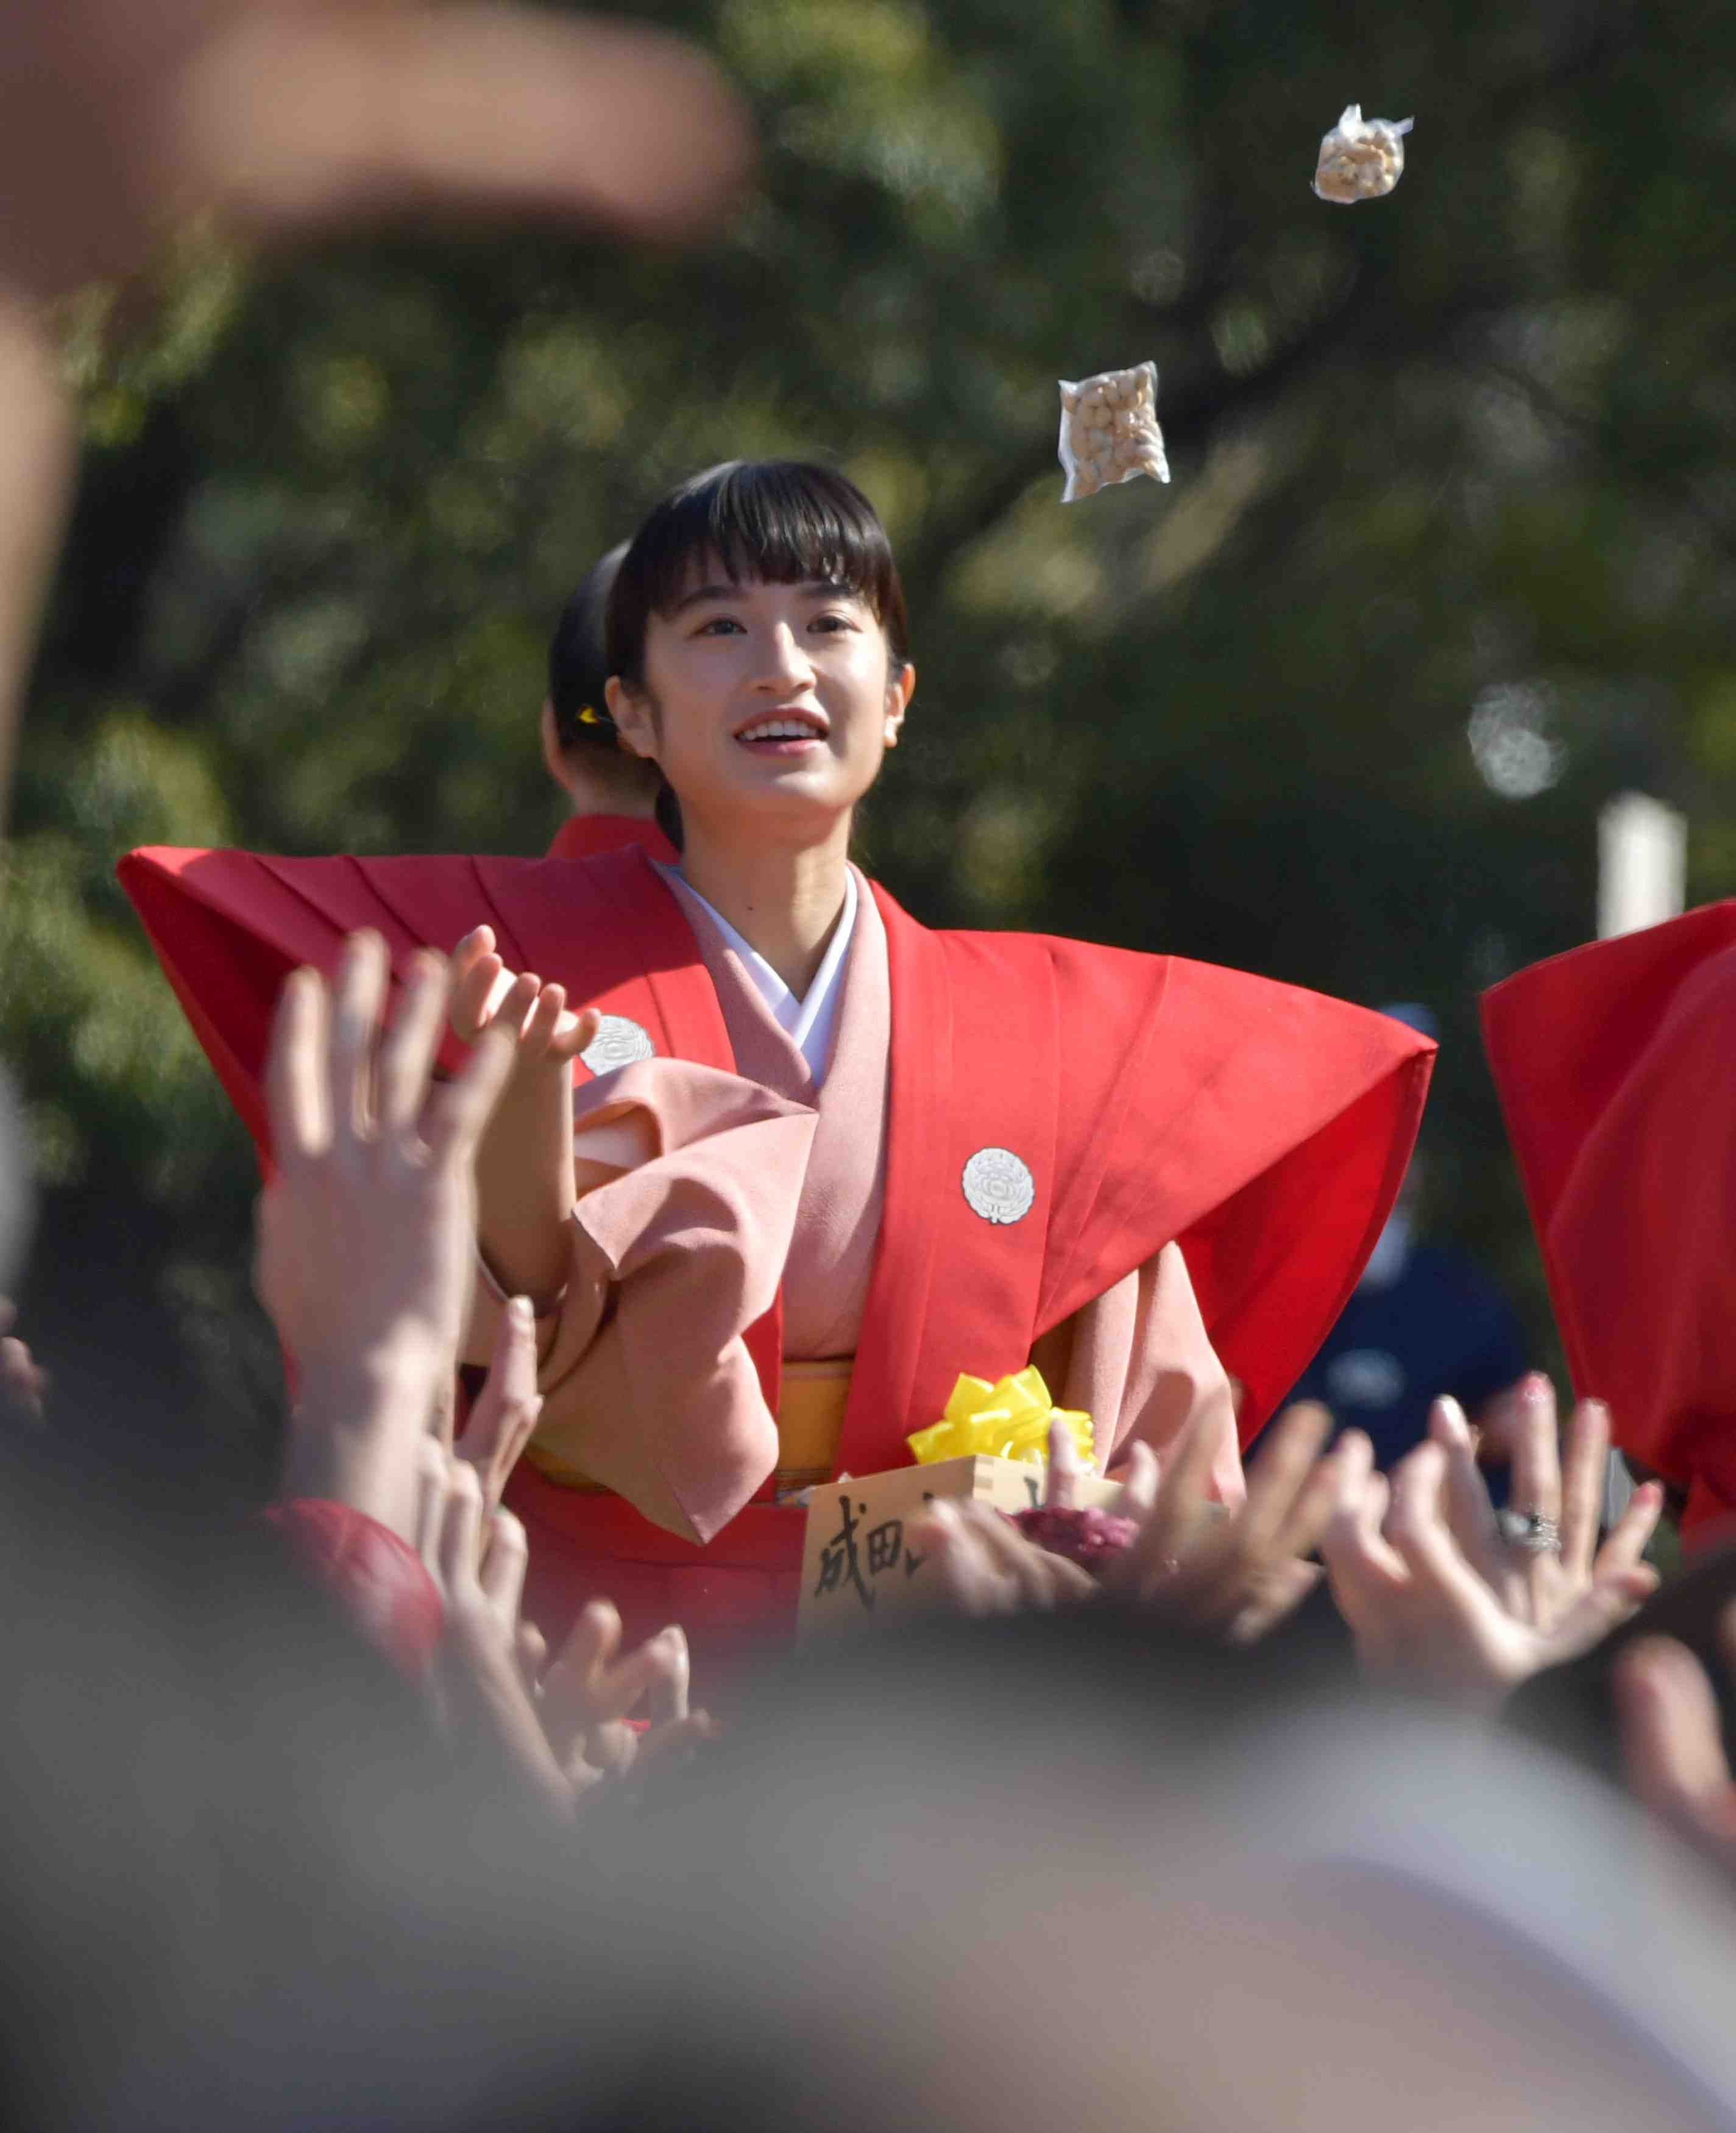 [Hidden Wonders of Japan] Sumo Wrestlers Hurl Soybeans in Adoring Crowd for Setsubun